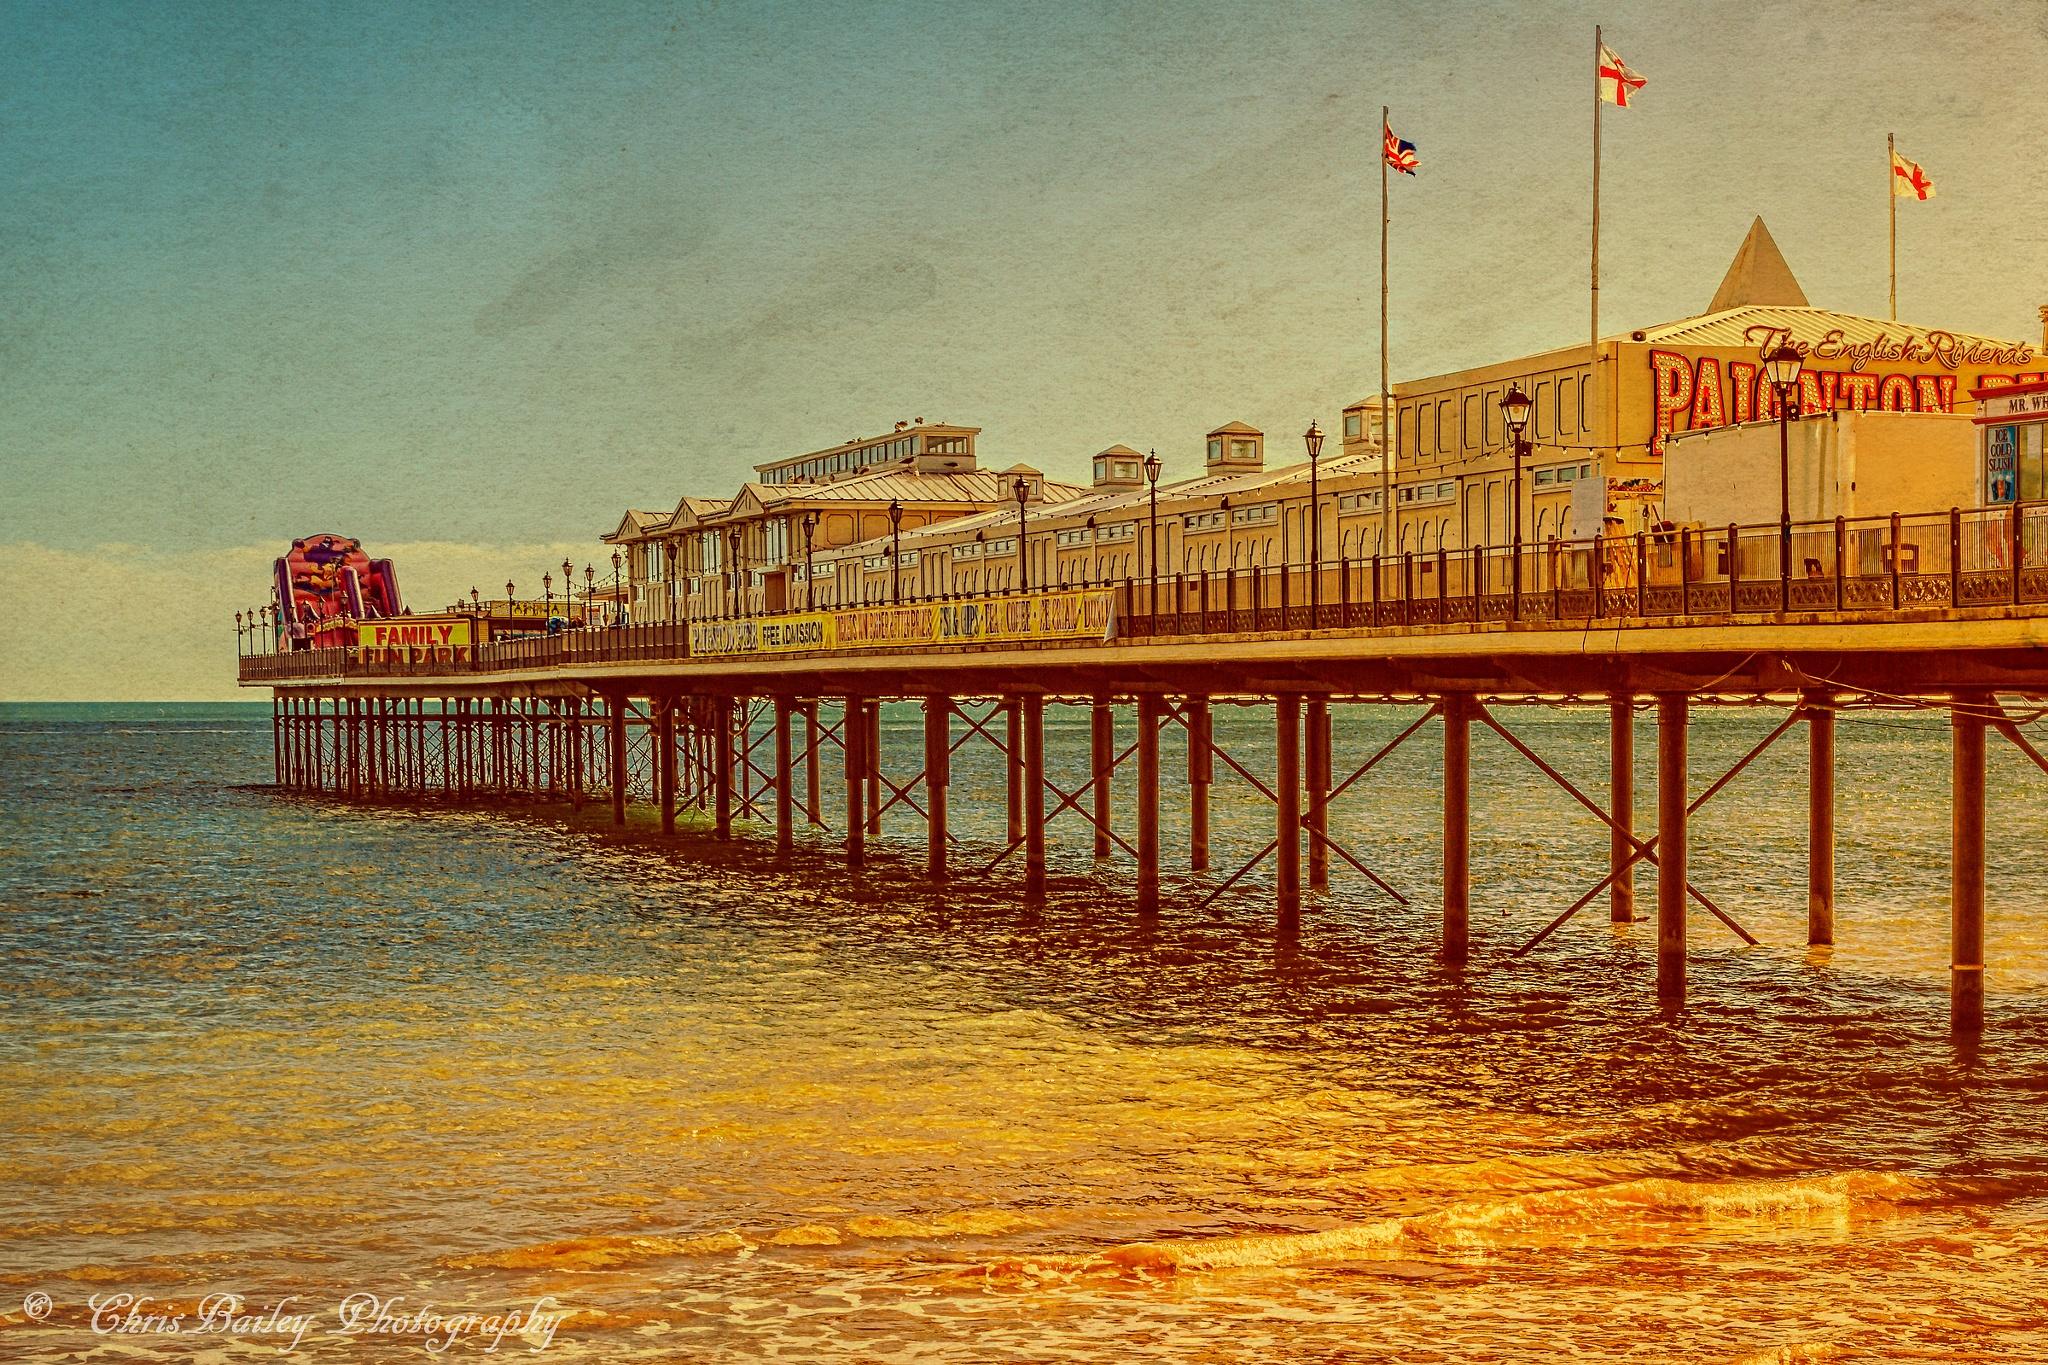 Paignton Pier. 02.6. 20160331 by Chris Bailey